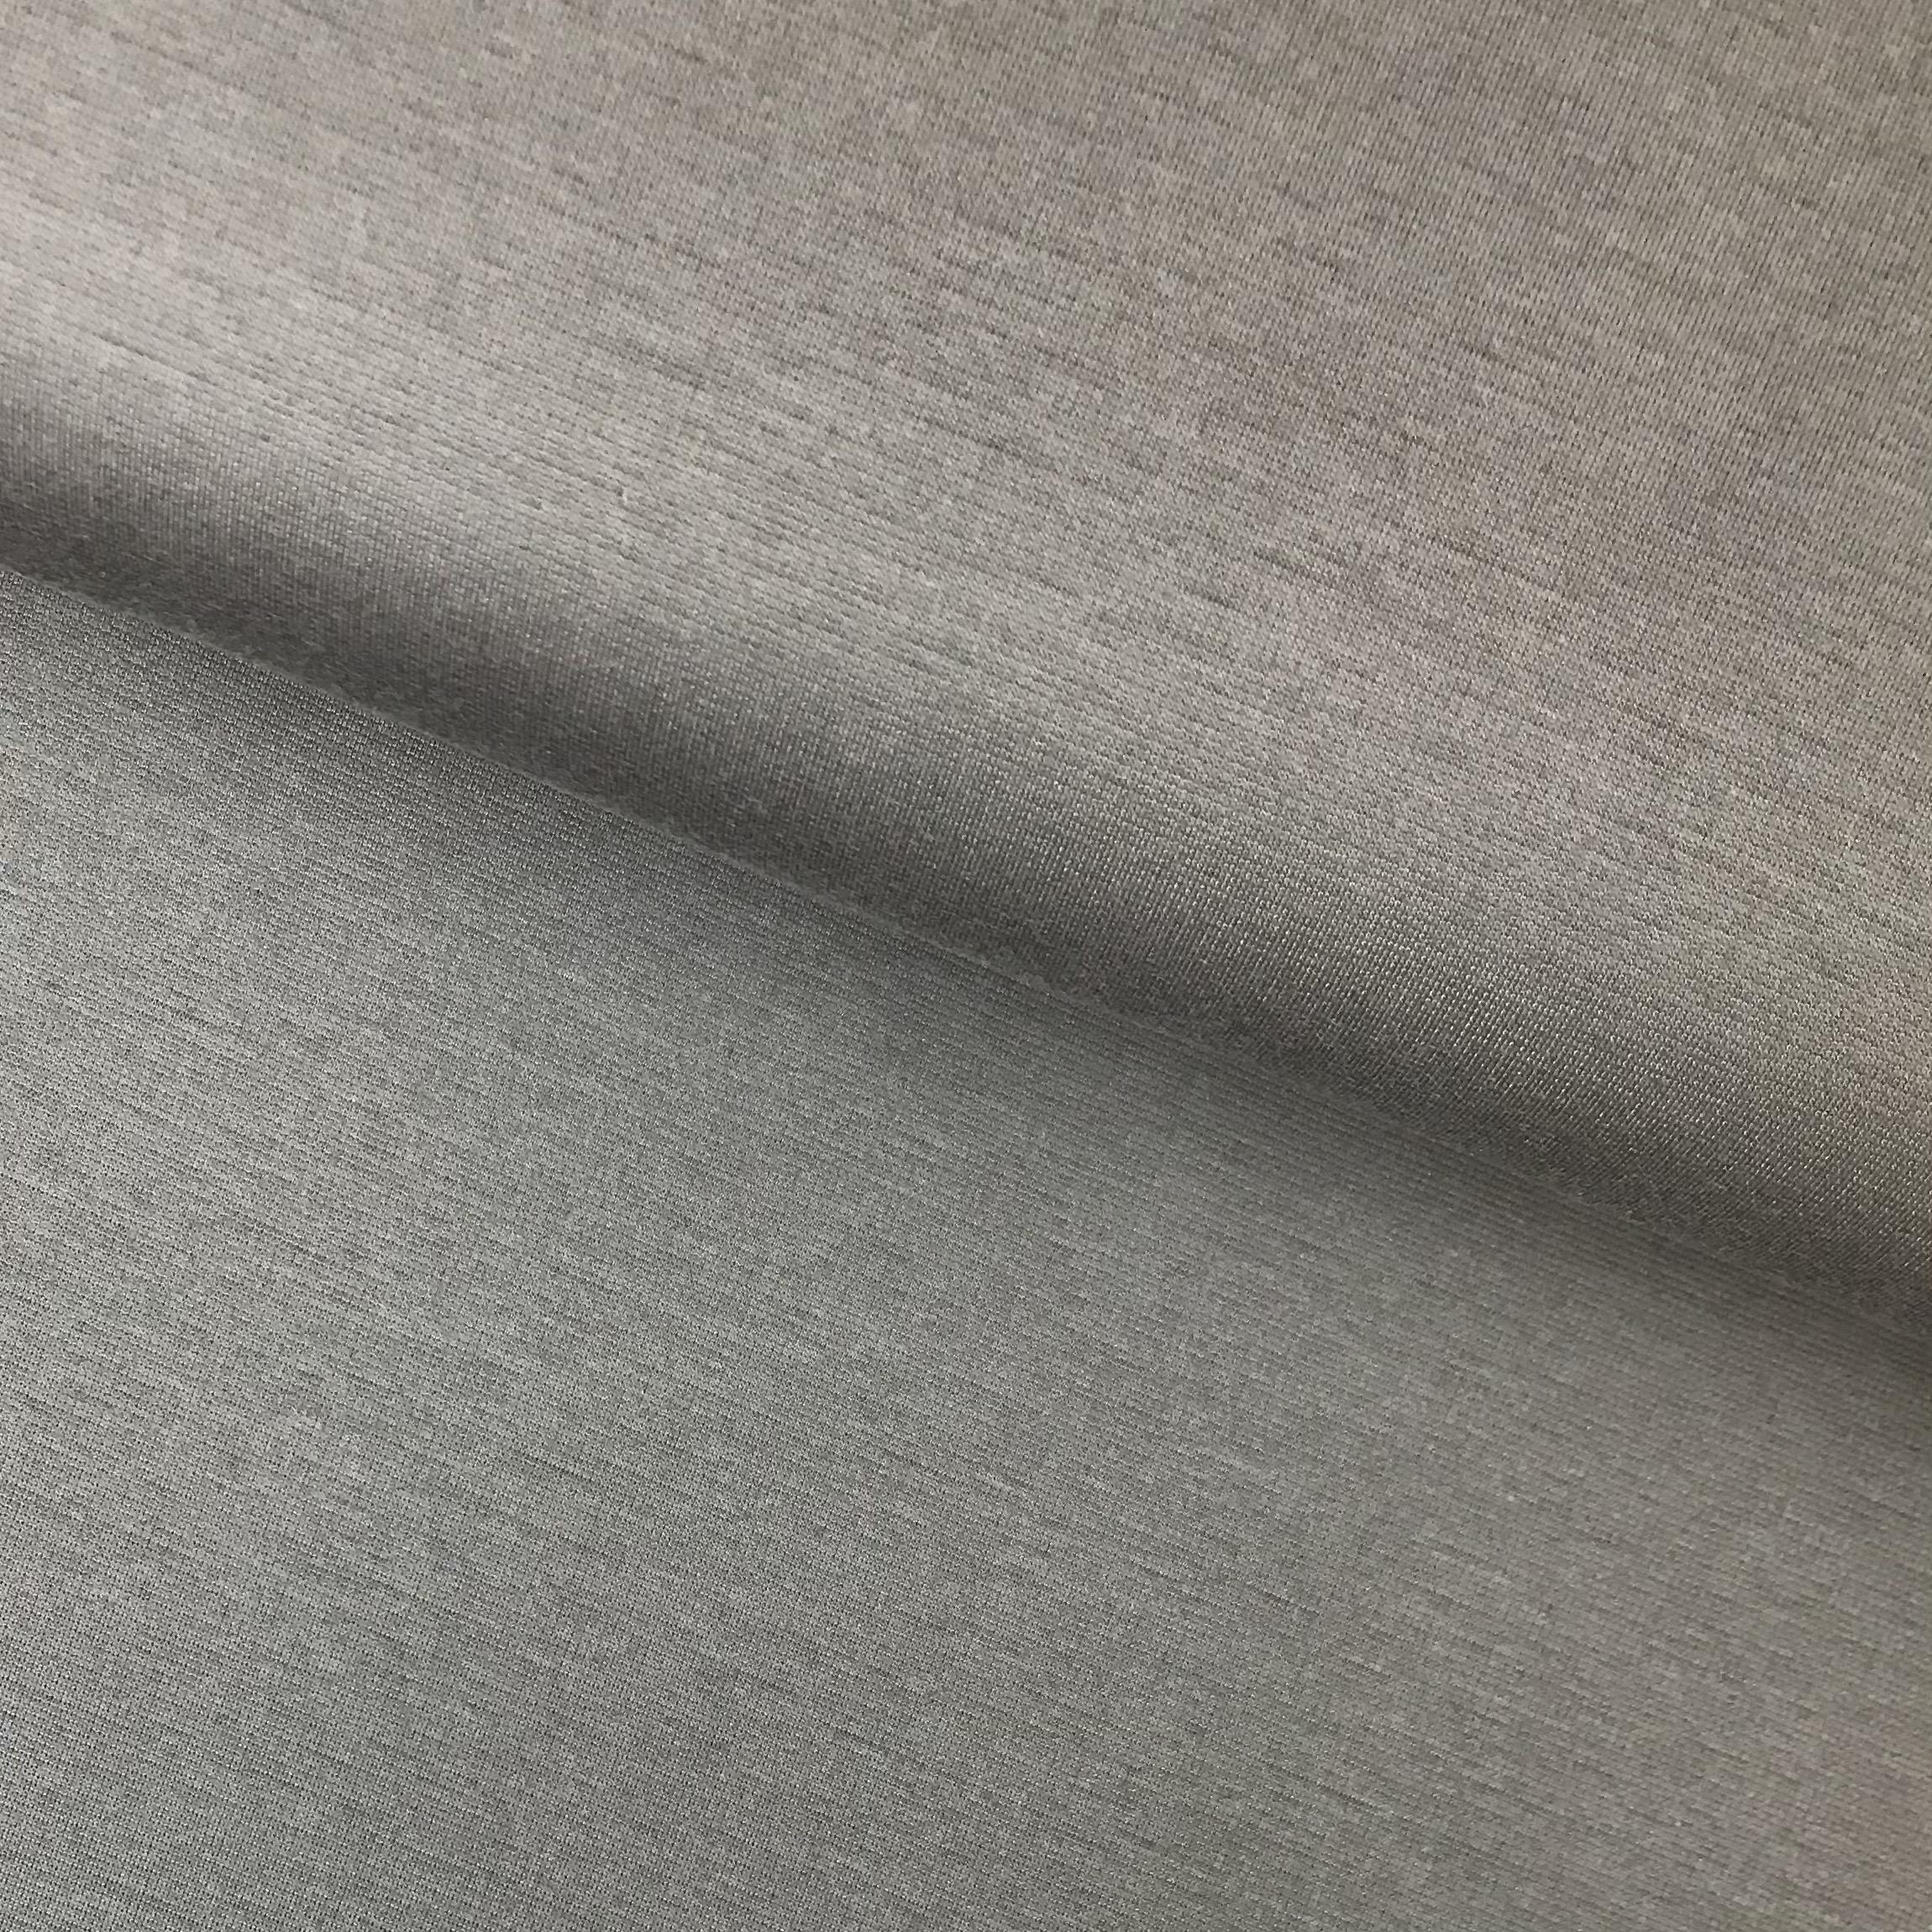 Comfort Romanit Jersey, taupe/braun. Art. 13598/054